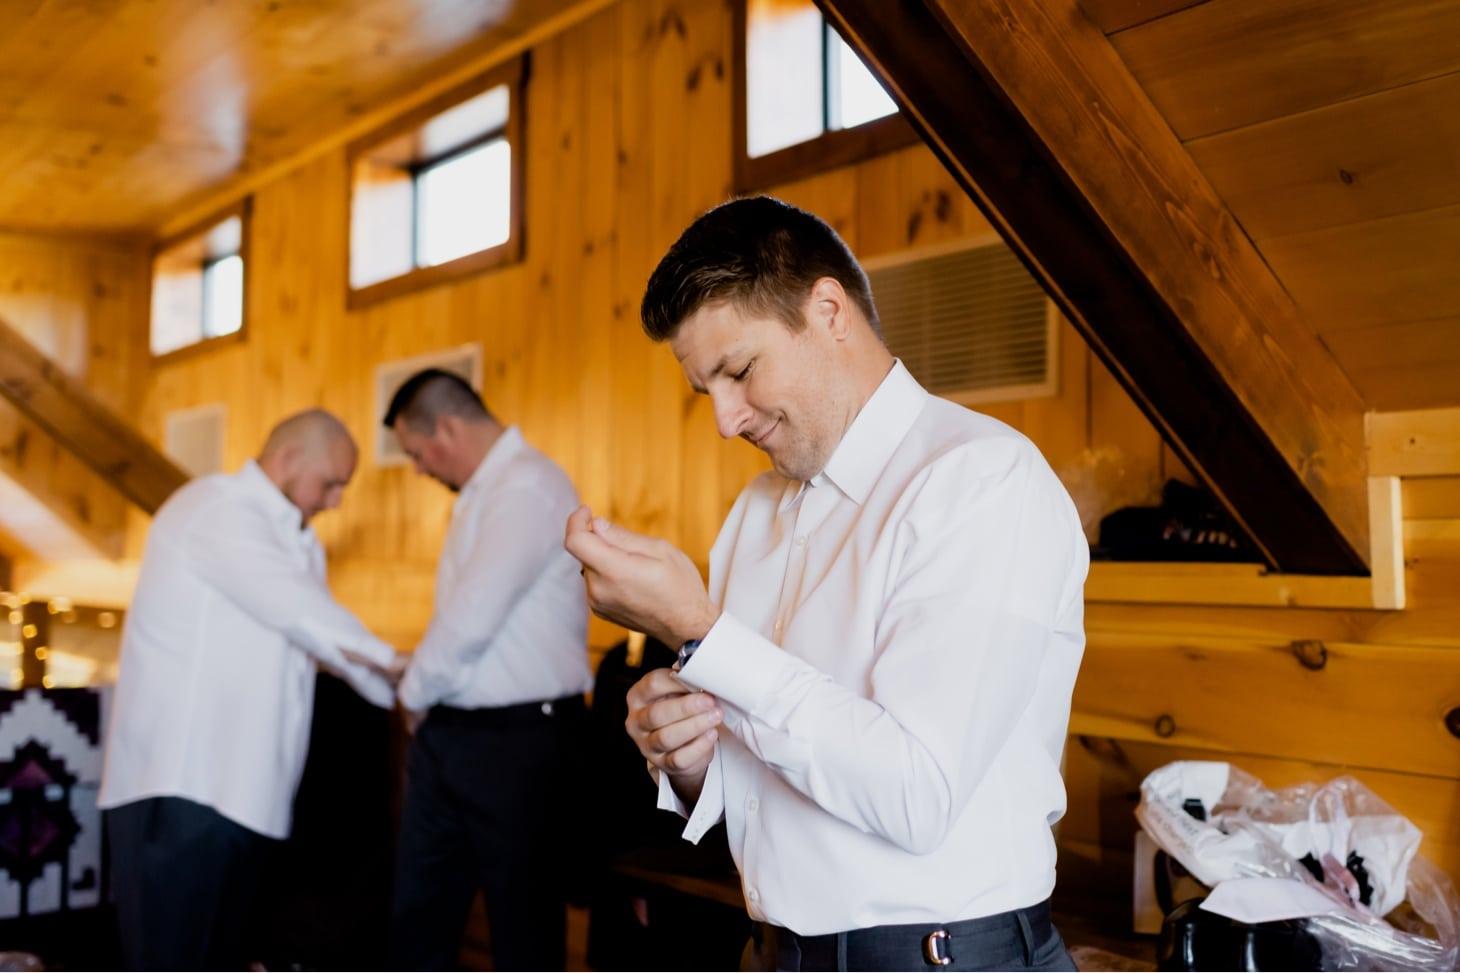 groomsmen getting ready photos adel iowa